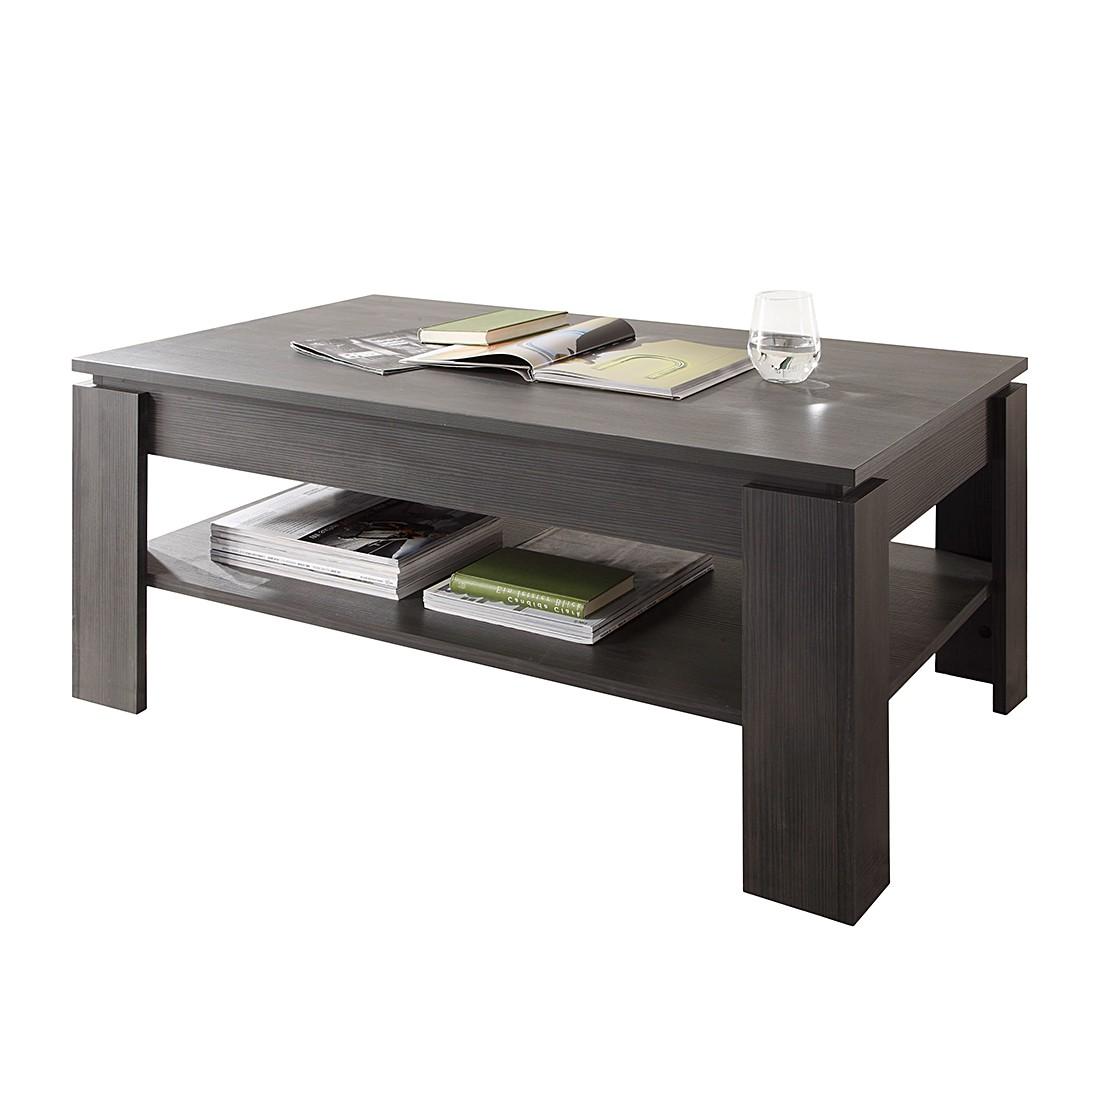 Table basse Elliot - Imitation frêne gris, Trendteam